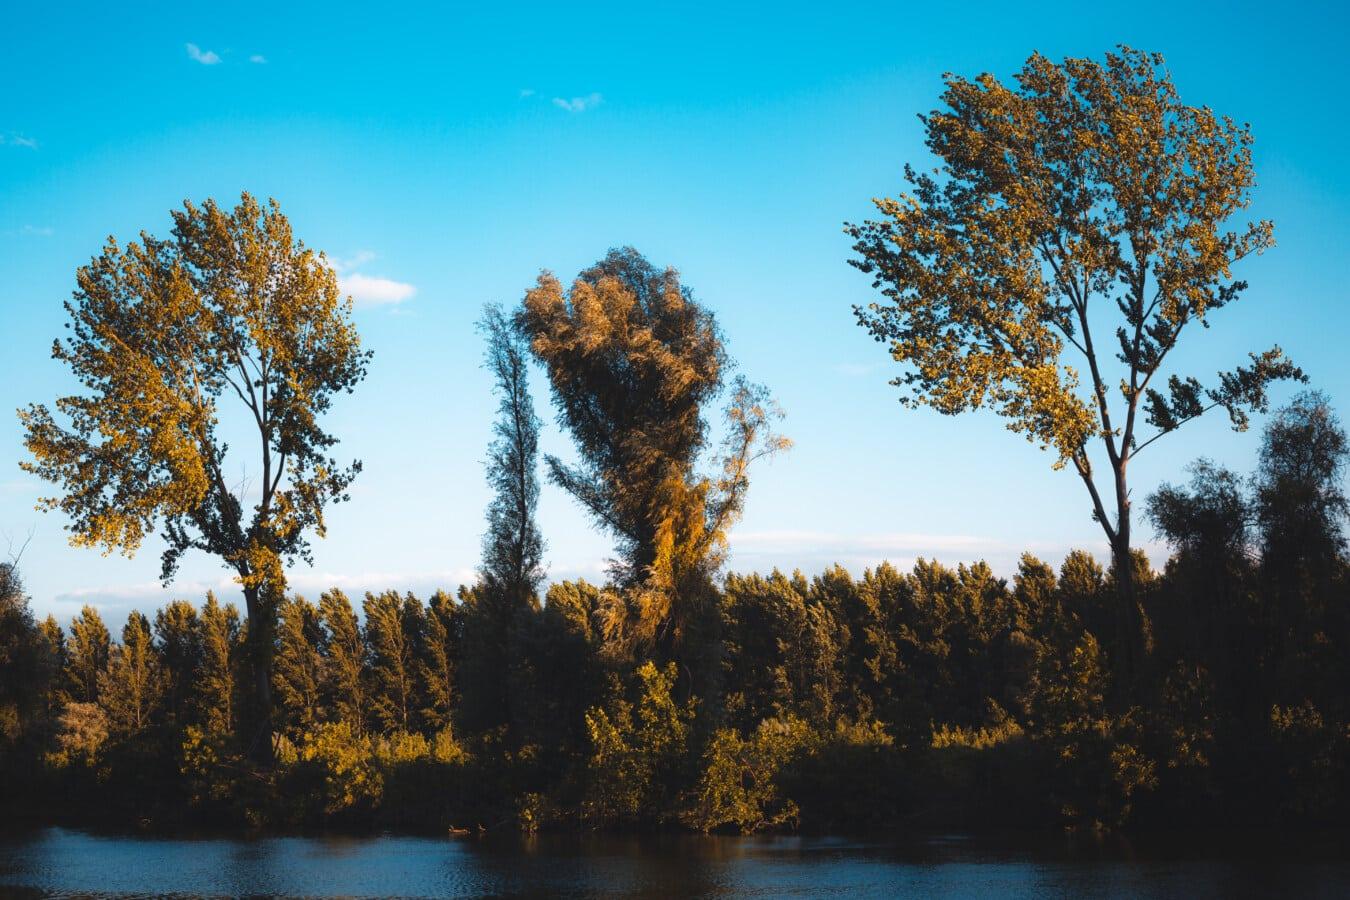 lake, lakeside, autumn season, forest, woodland, poplar, landscape, leaf, lighting, dawn